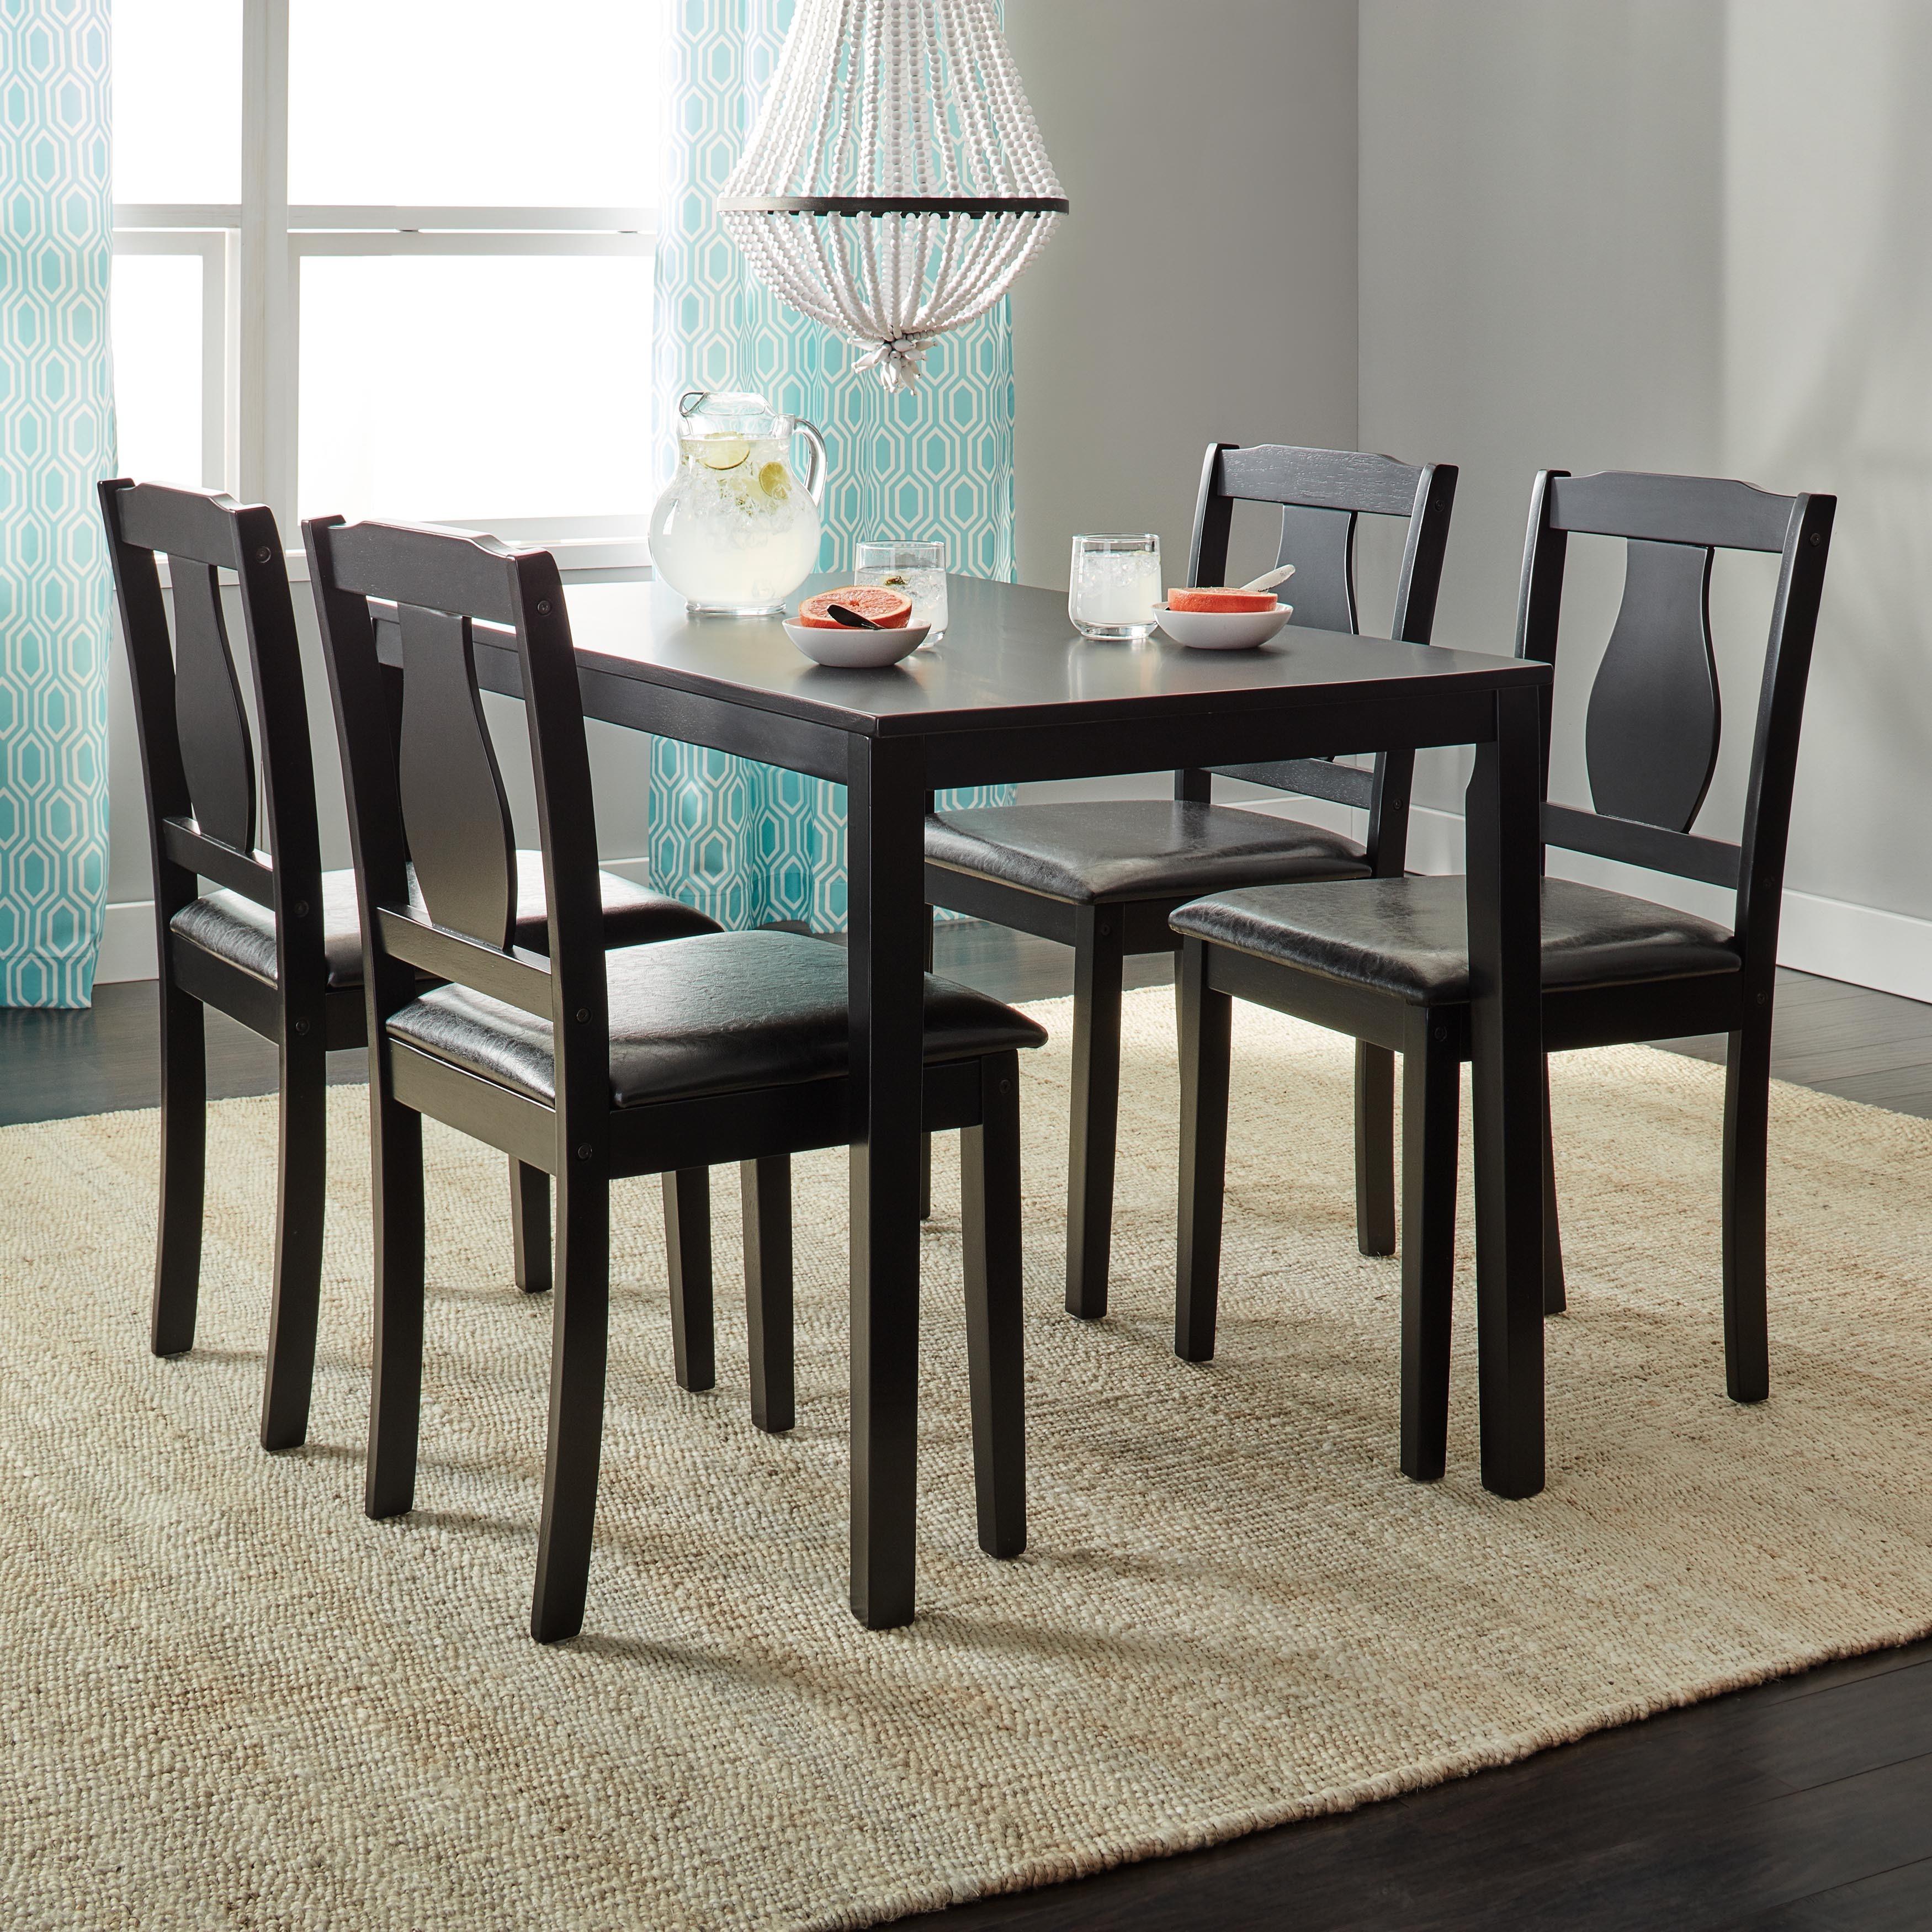 Shop Simple Living Black 5-piece Kaylee Dining Set - On Sale - Free ... 0a59040fa732